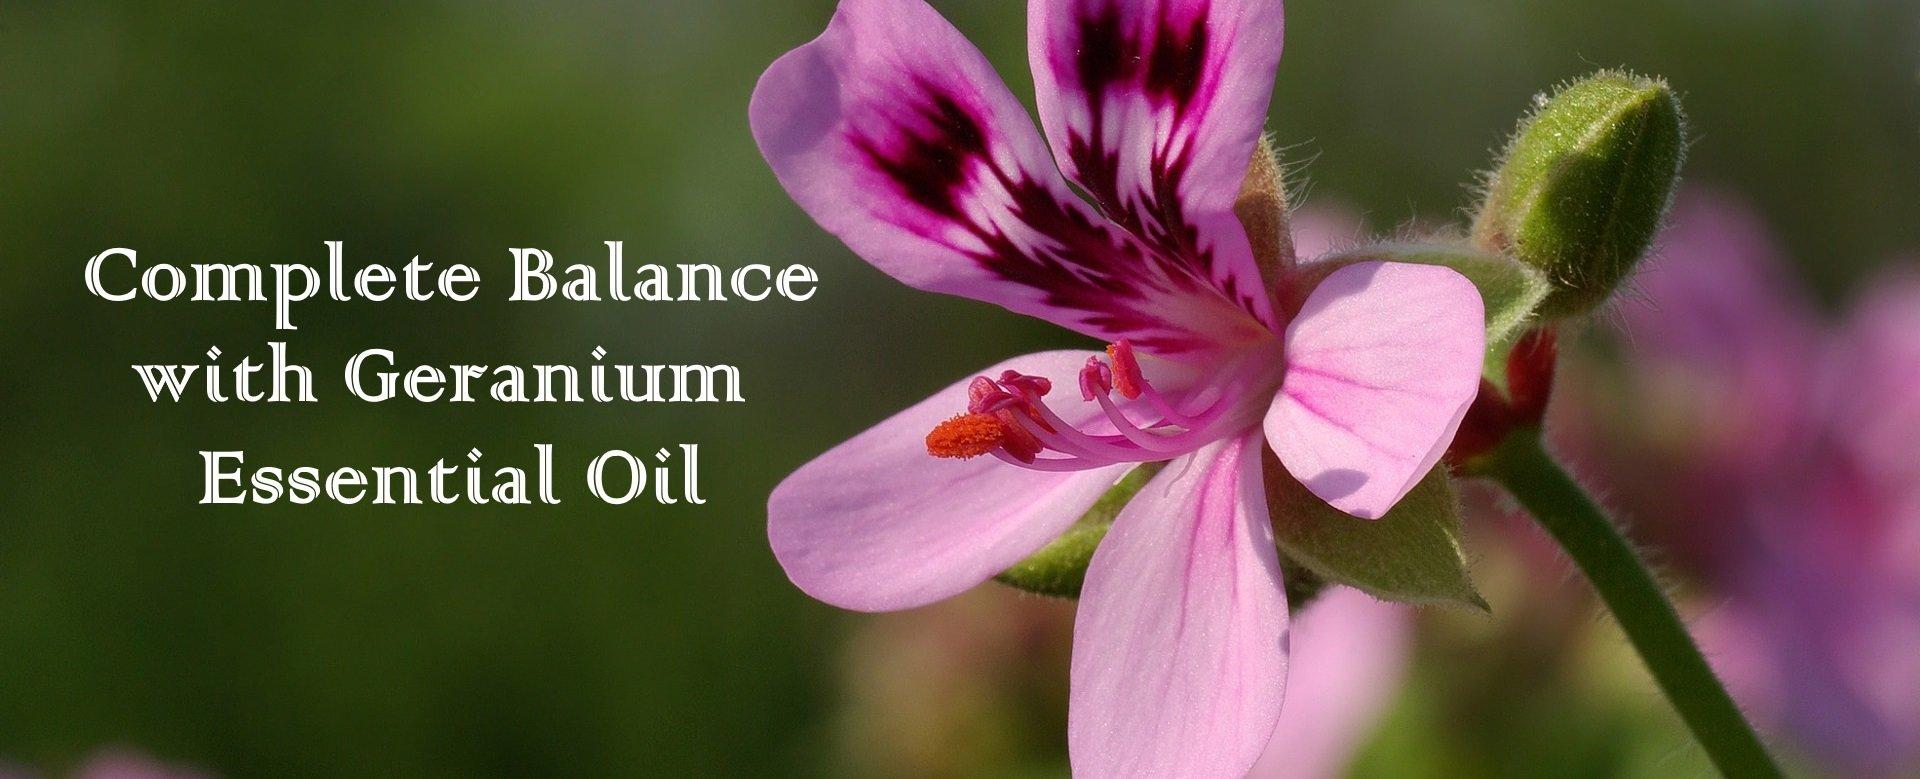 Complete Balance with Geranium Essential Oil